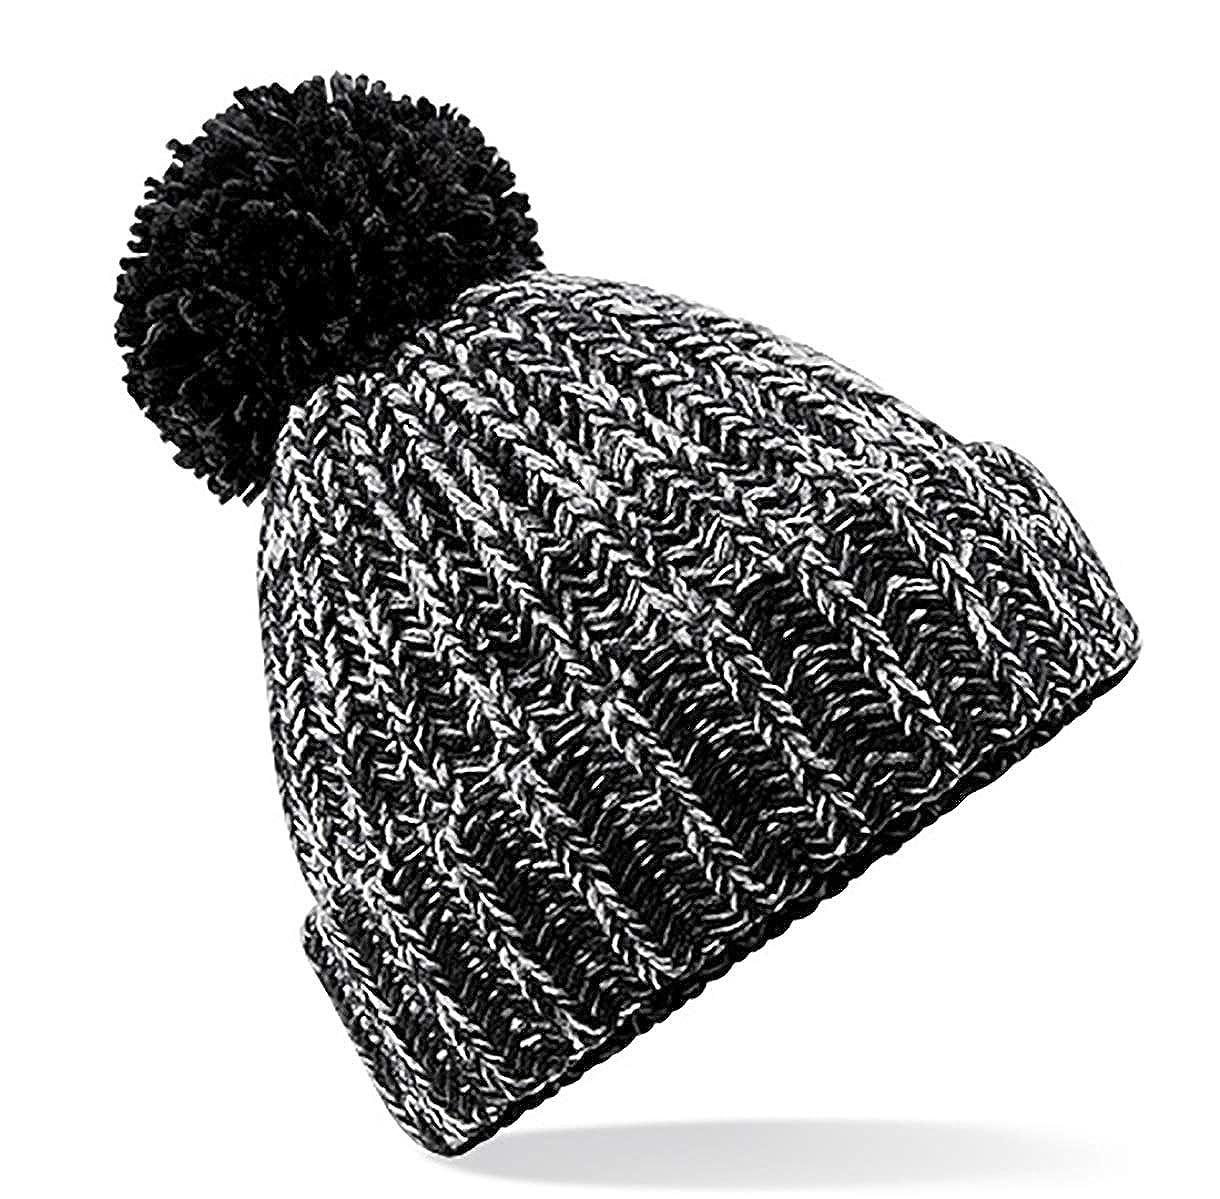 86c39de56c9 4sold Mens Womens Beanie Warm Winter Corkscrew Cable Knitted Bobble Hat  Plain Ski Pom Wooly Cap (One Size